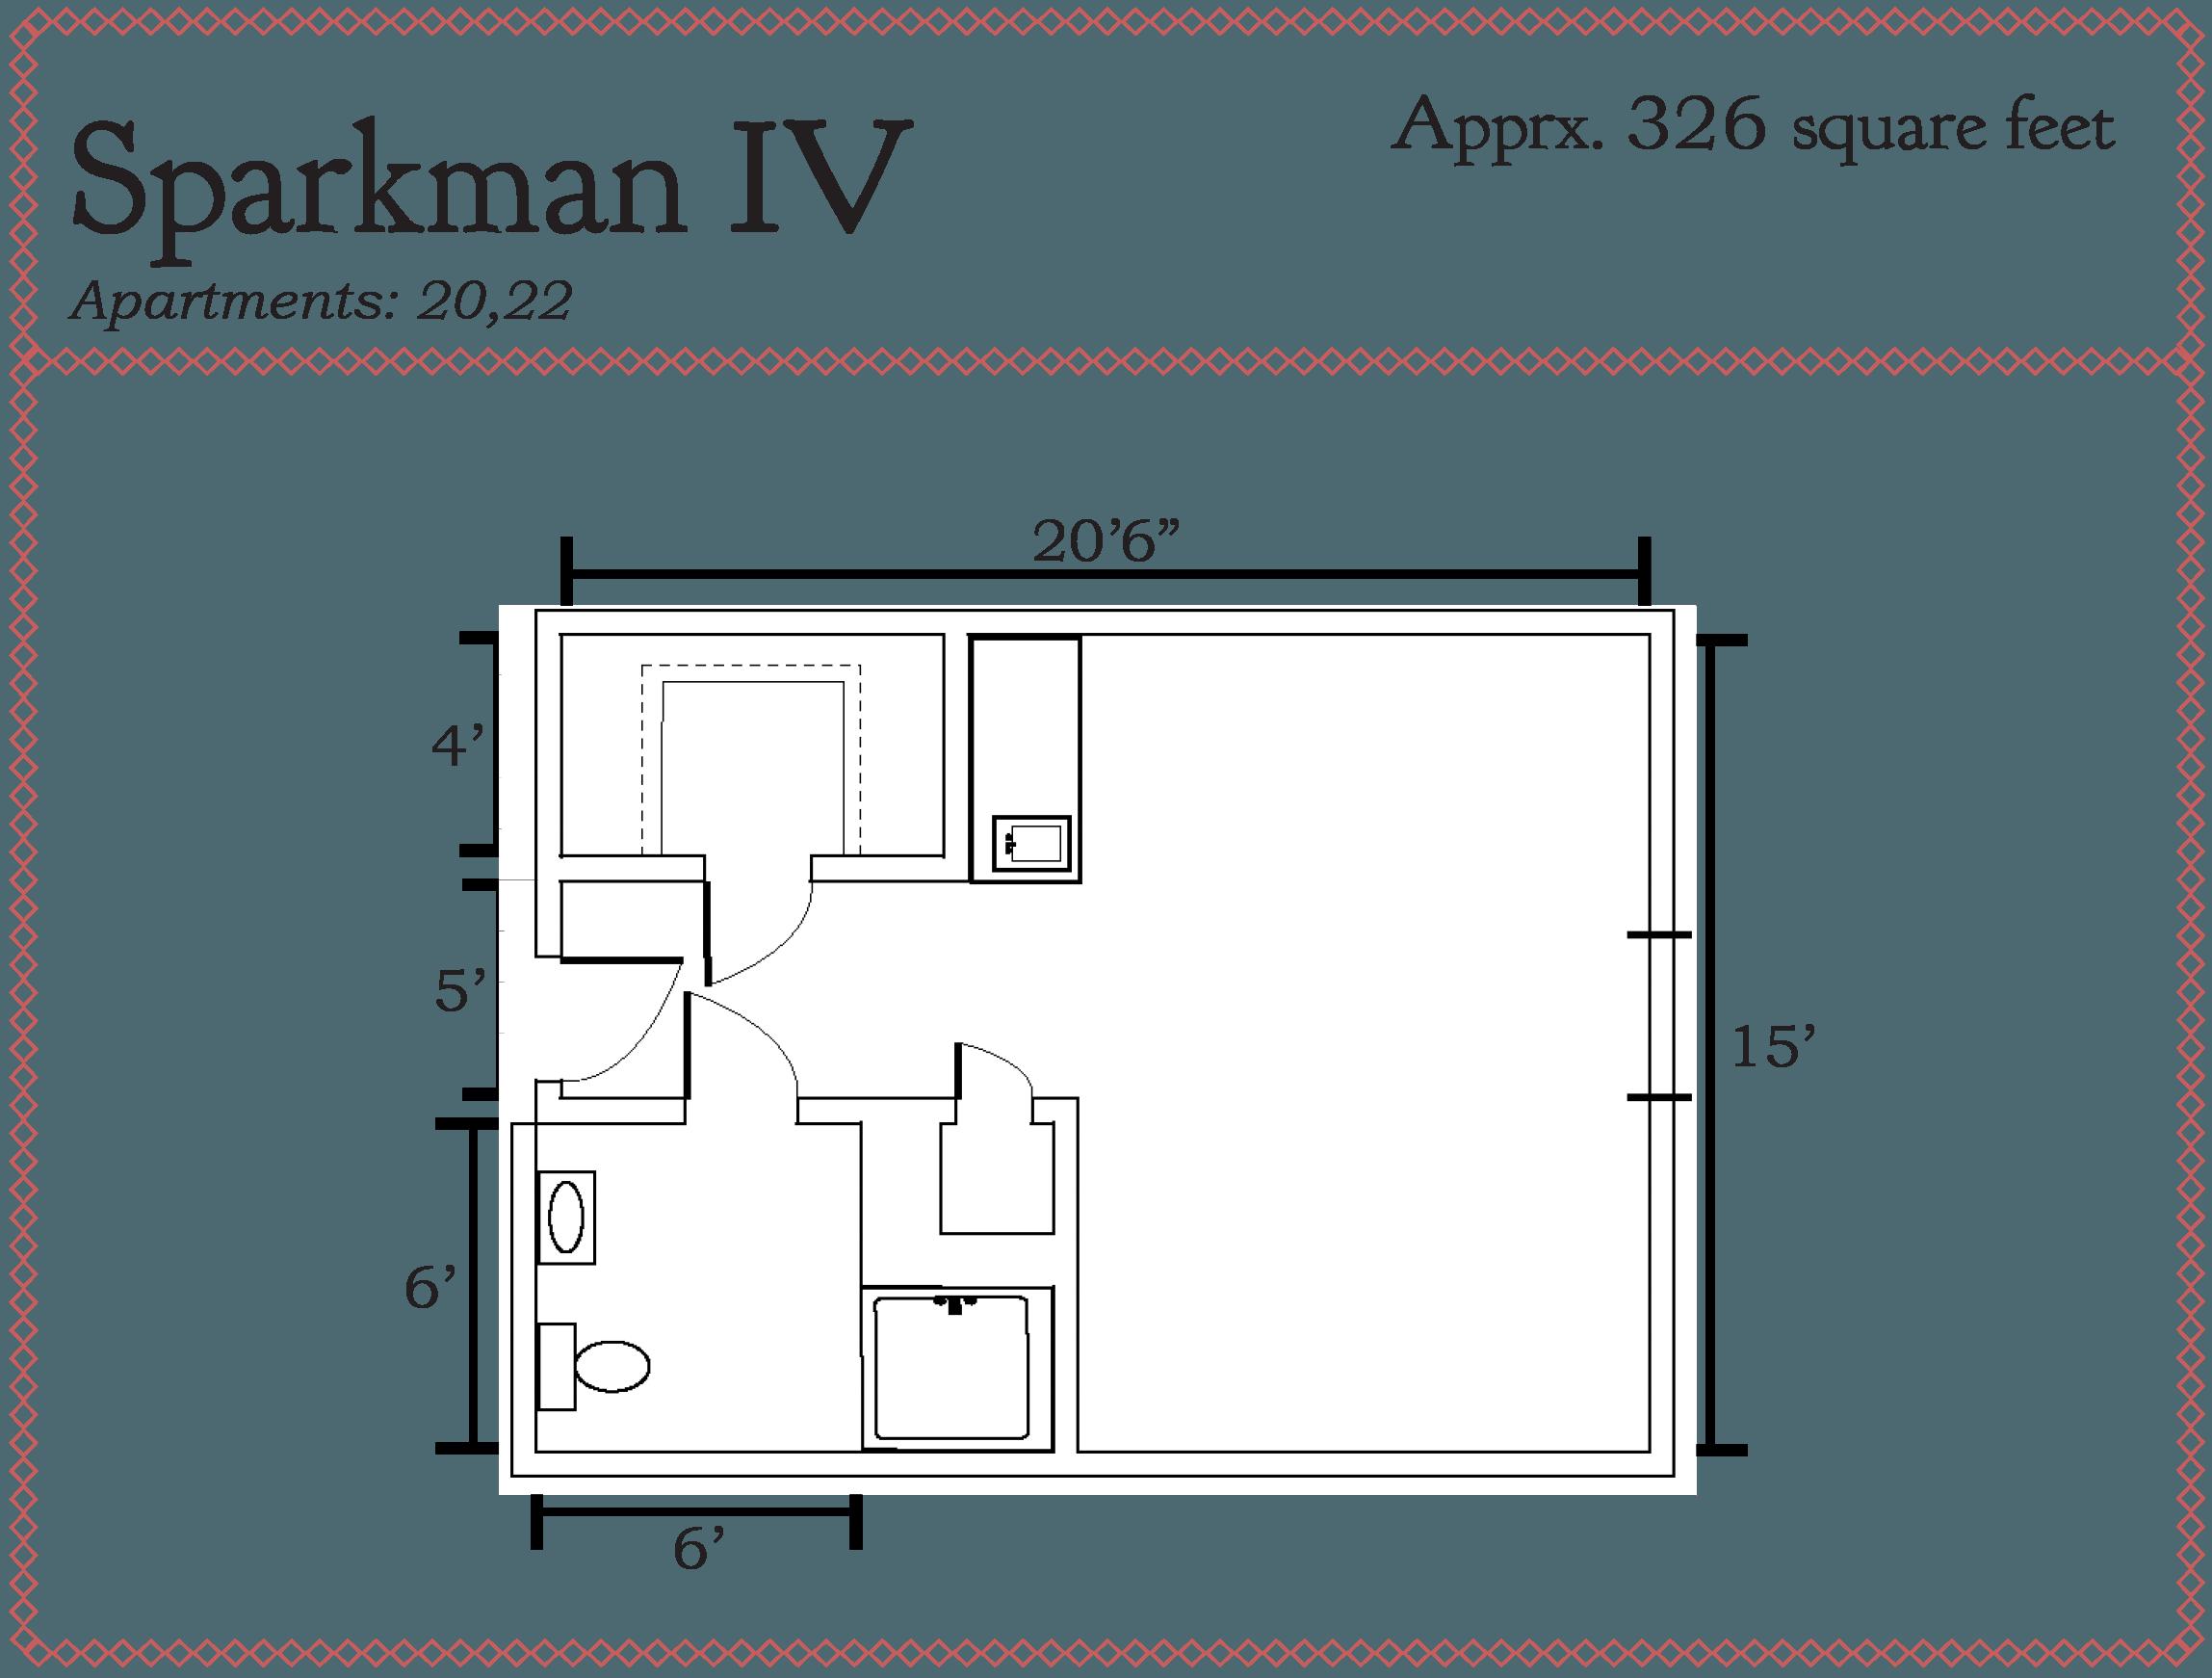 Sparkman IV